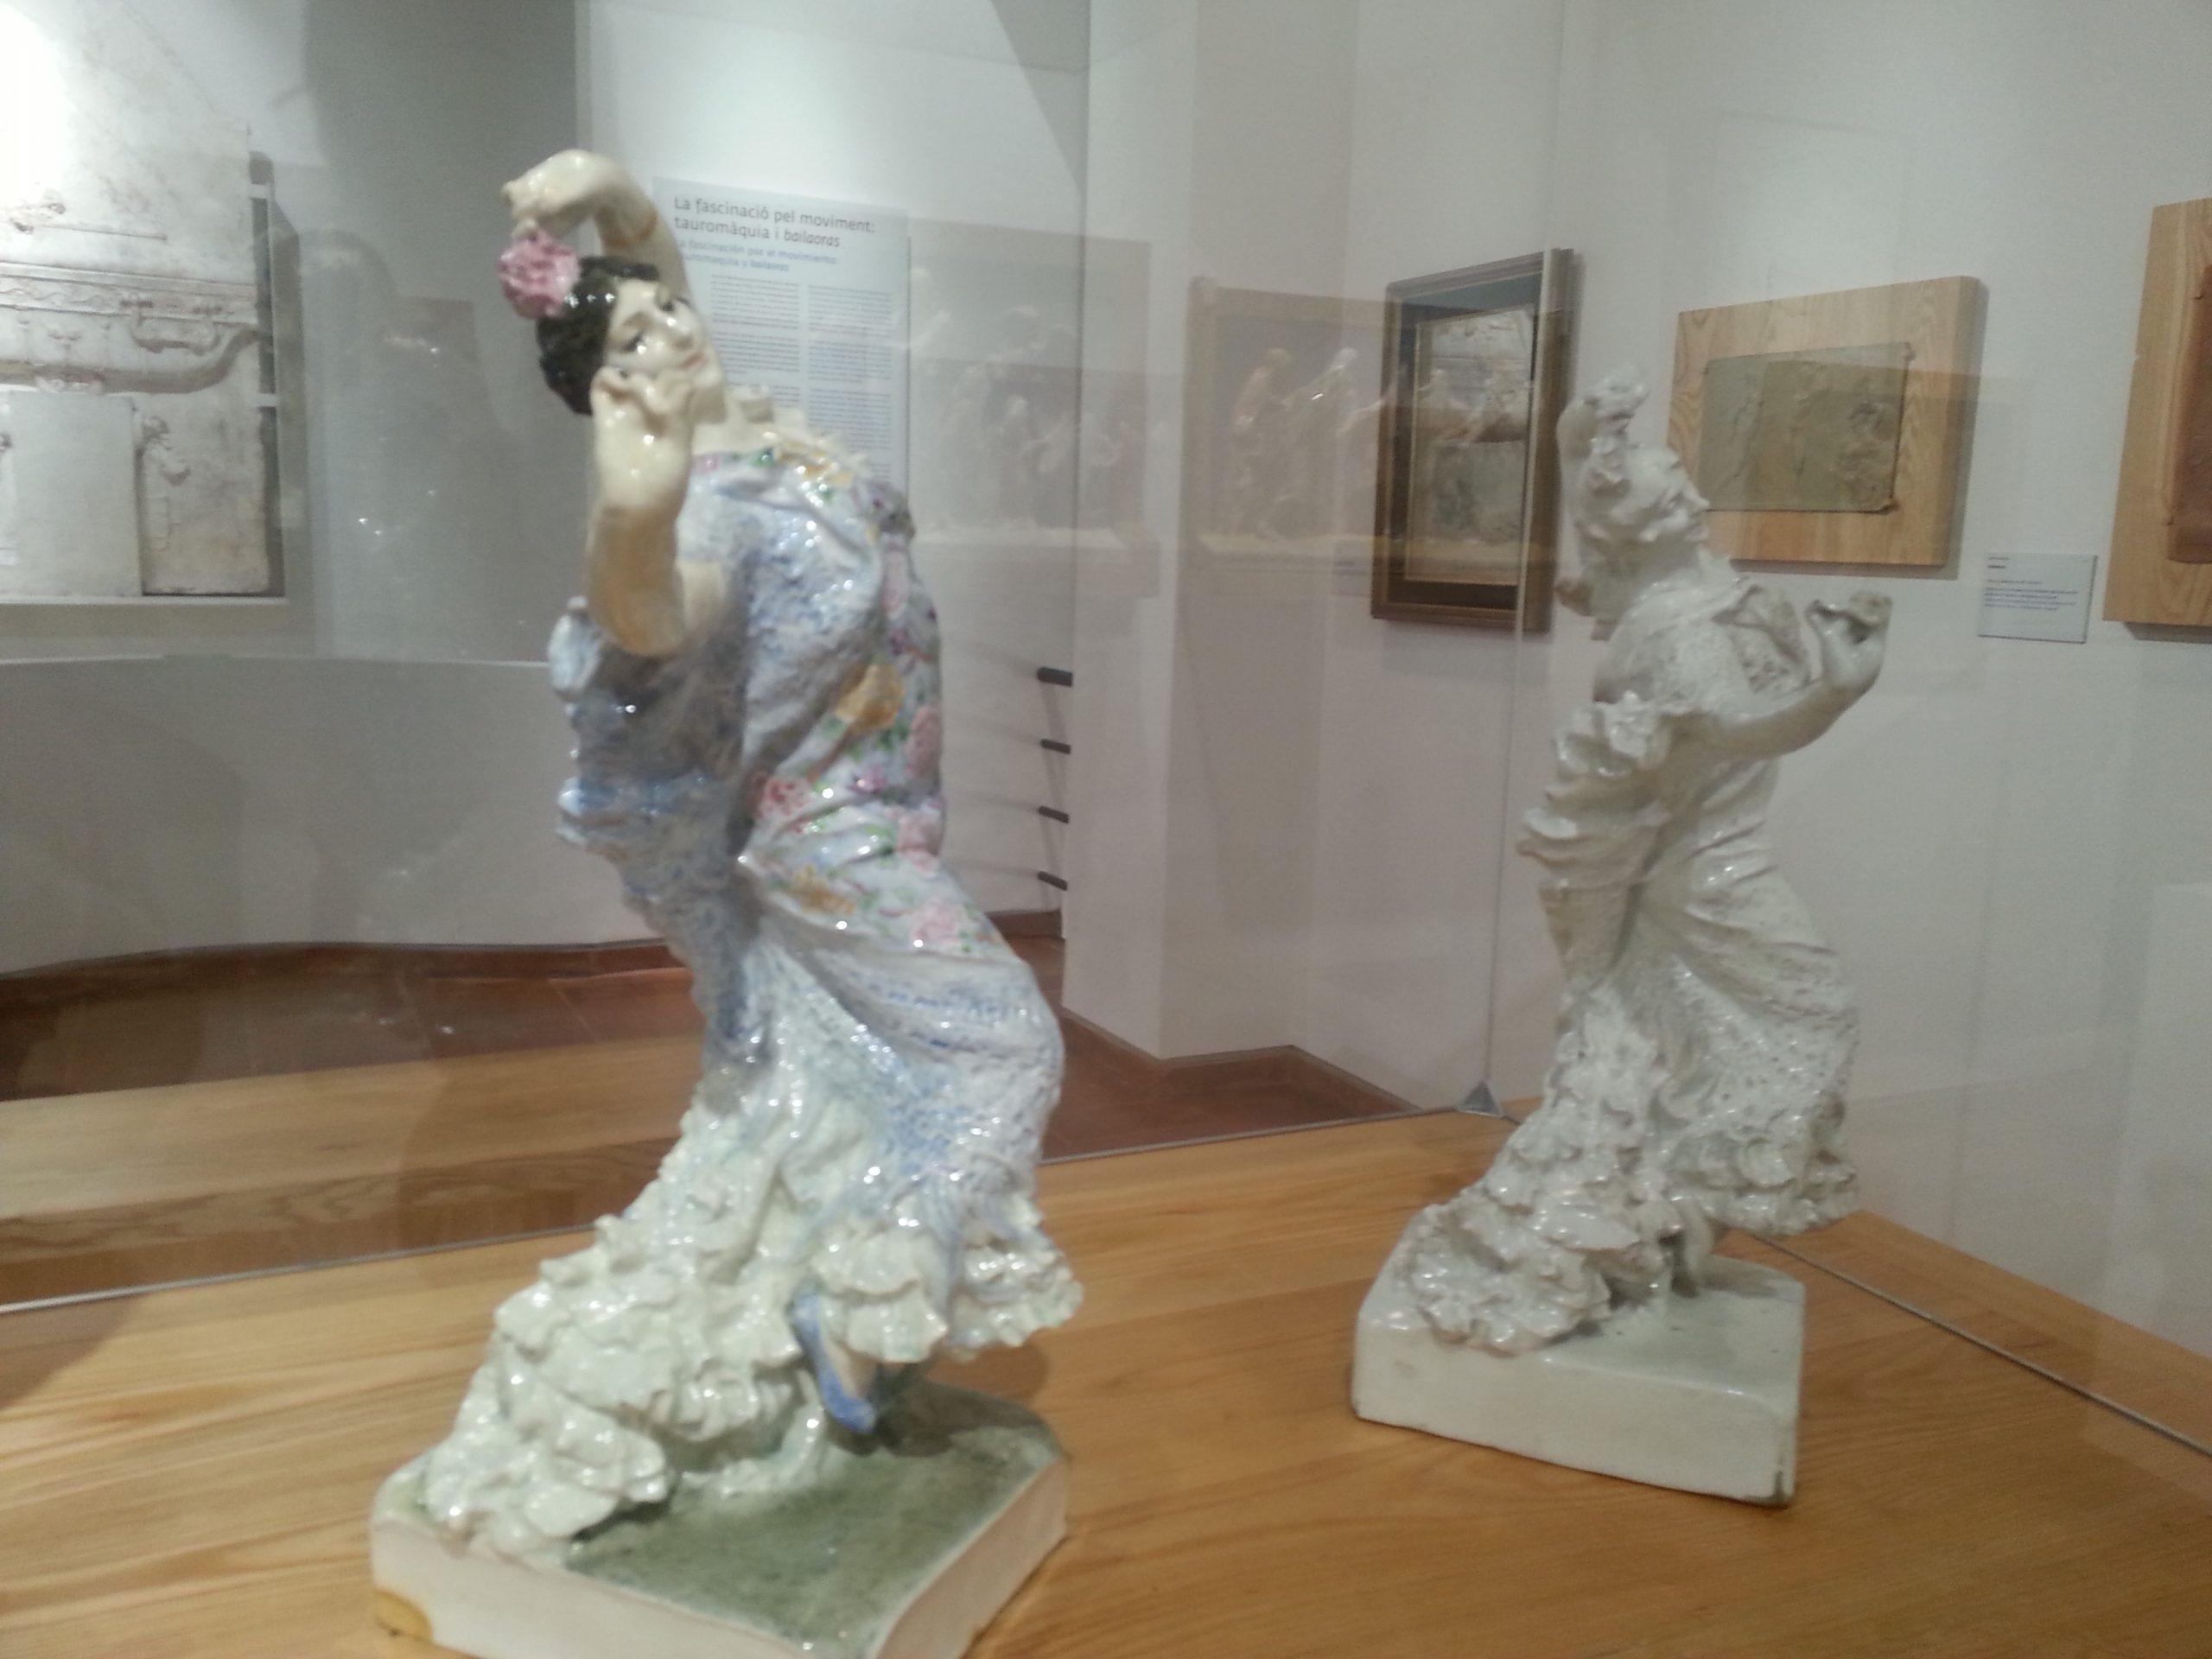 esculturas femeninas en porcelana museo benlliure